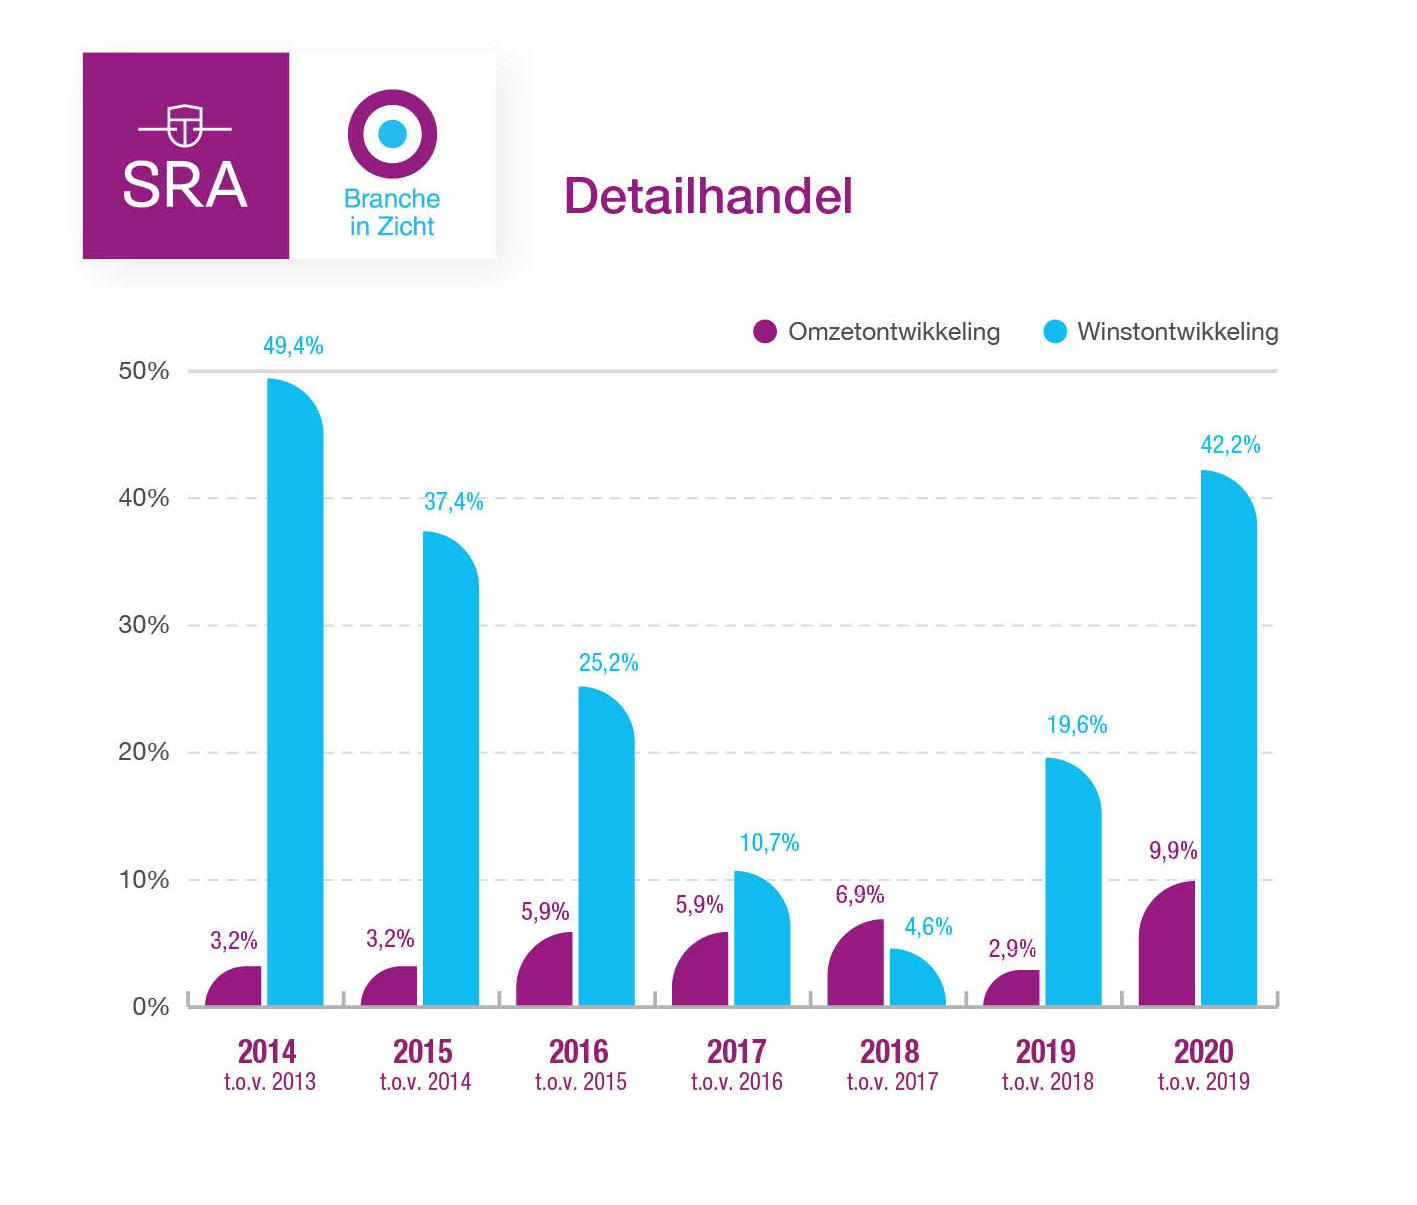 detailhandel coronacrisis cijfers 2020